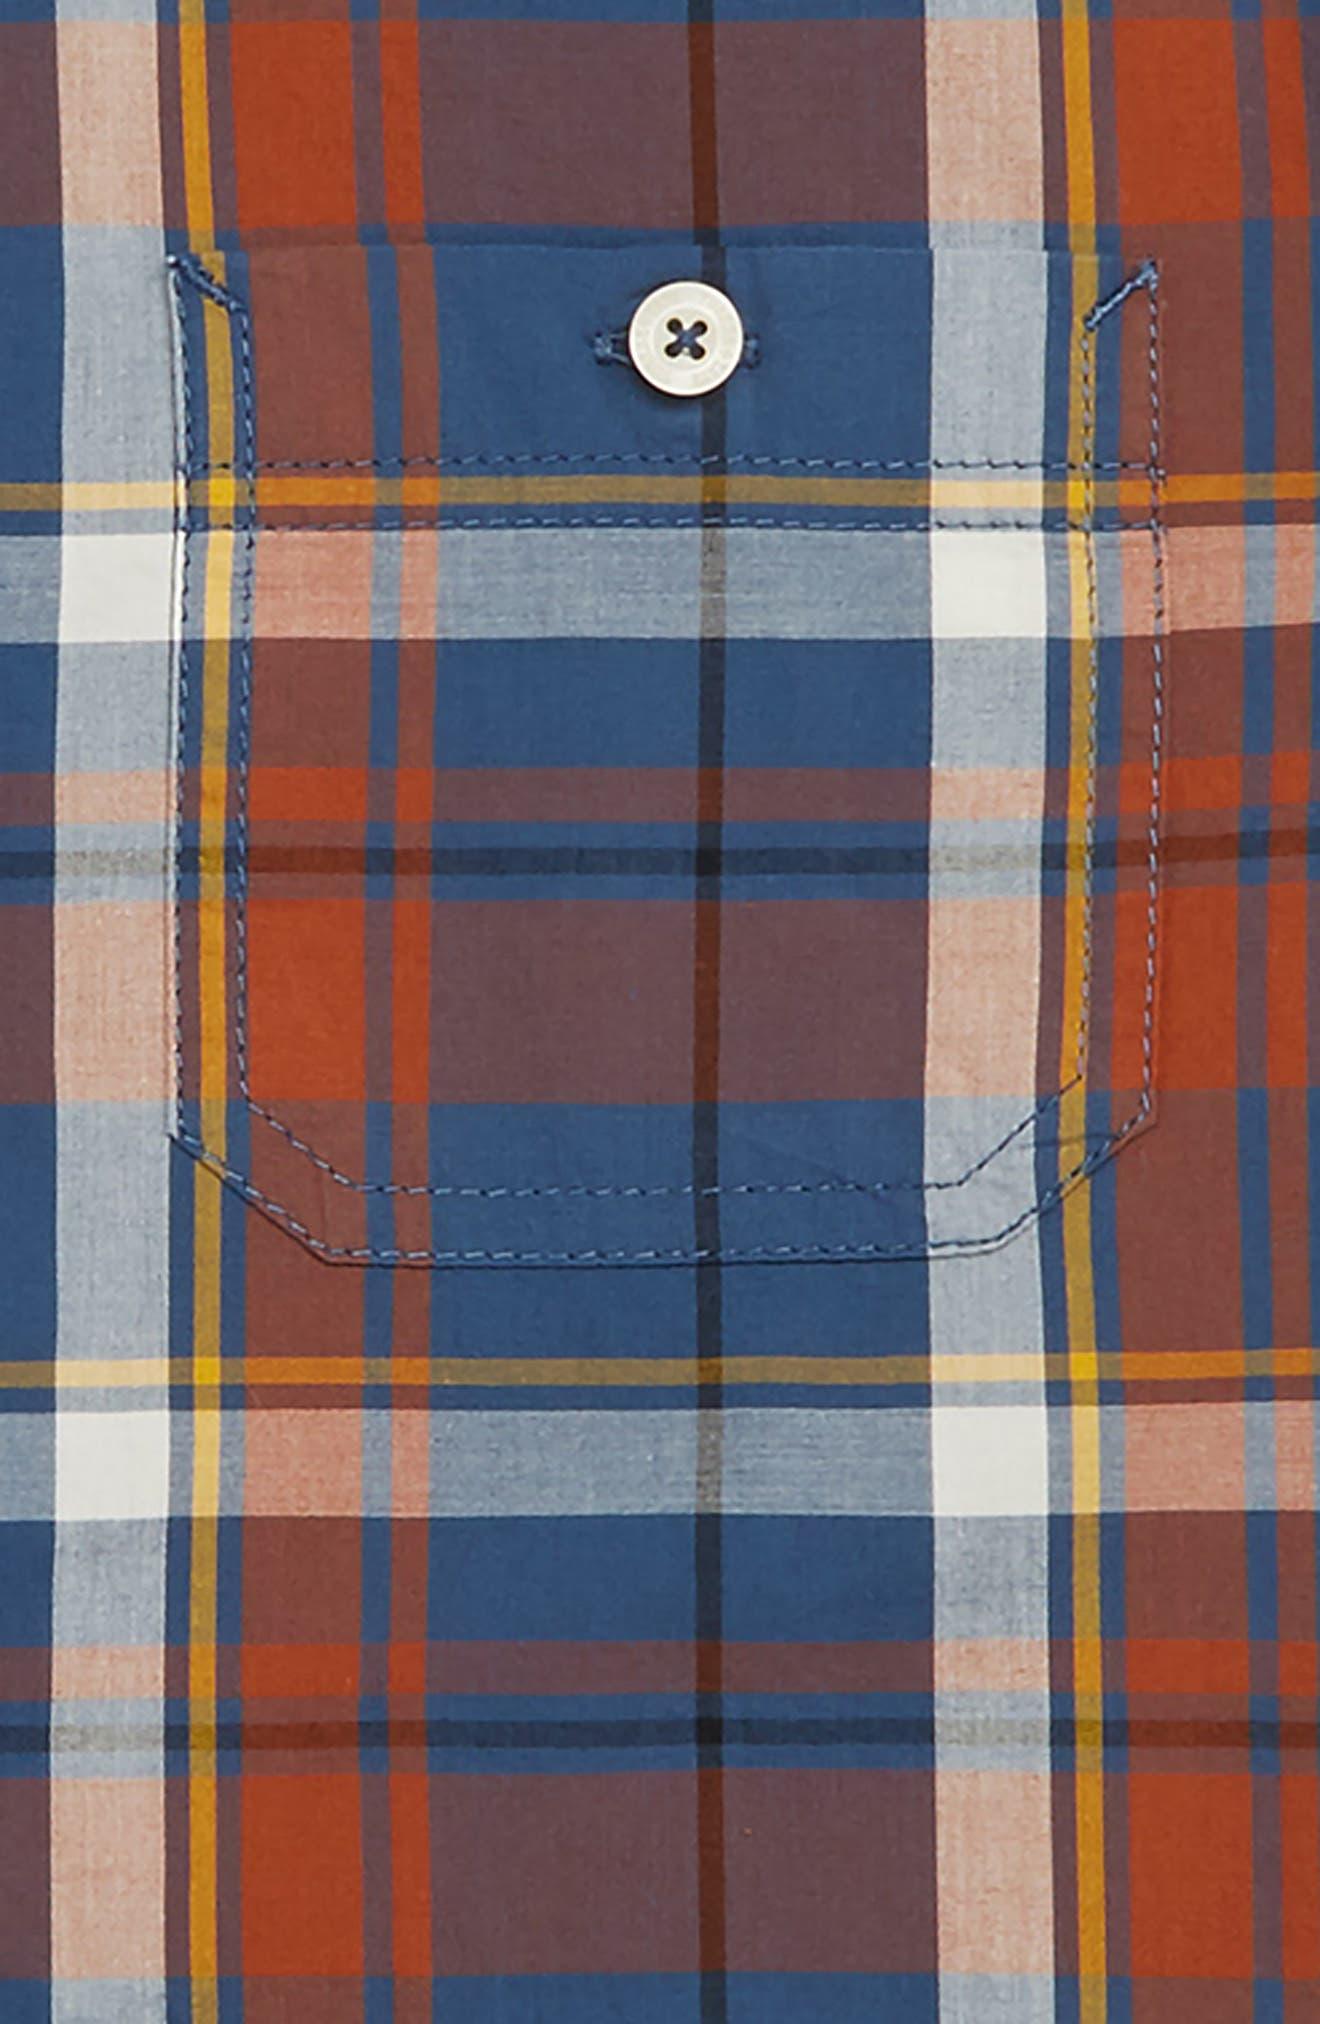 'Photo Op' Long Sleeve Cotton Woven Shirt,                             Alternate thumbnail 2, color,                             NAVY DENIM MADRAS PLAID